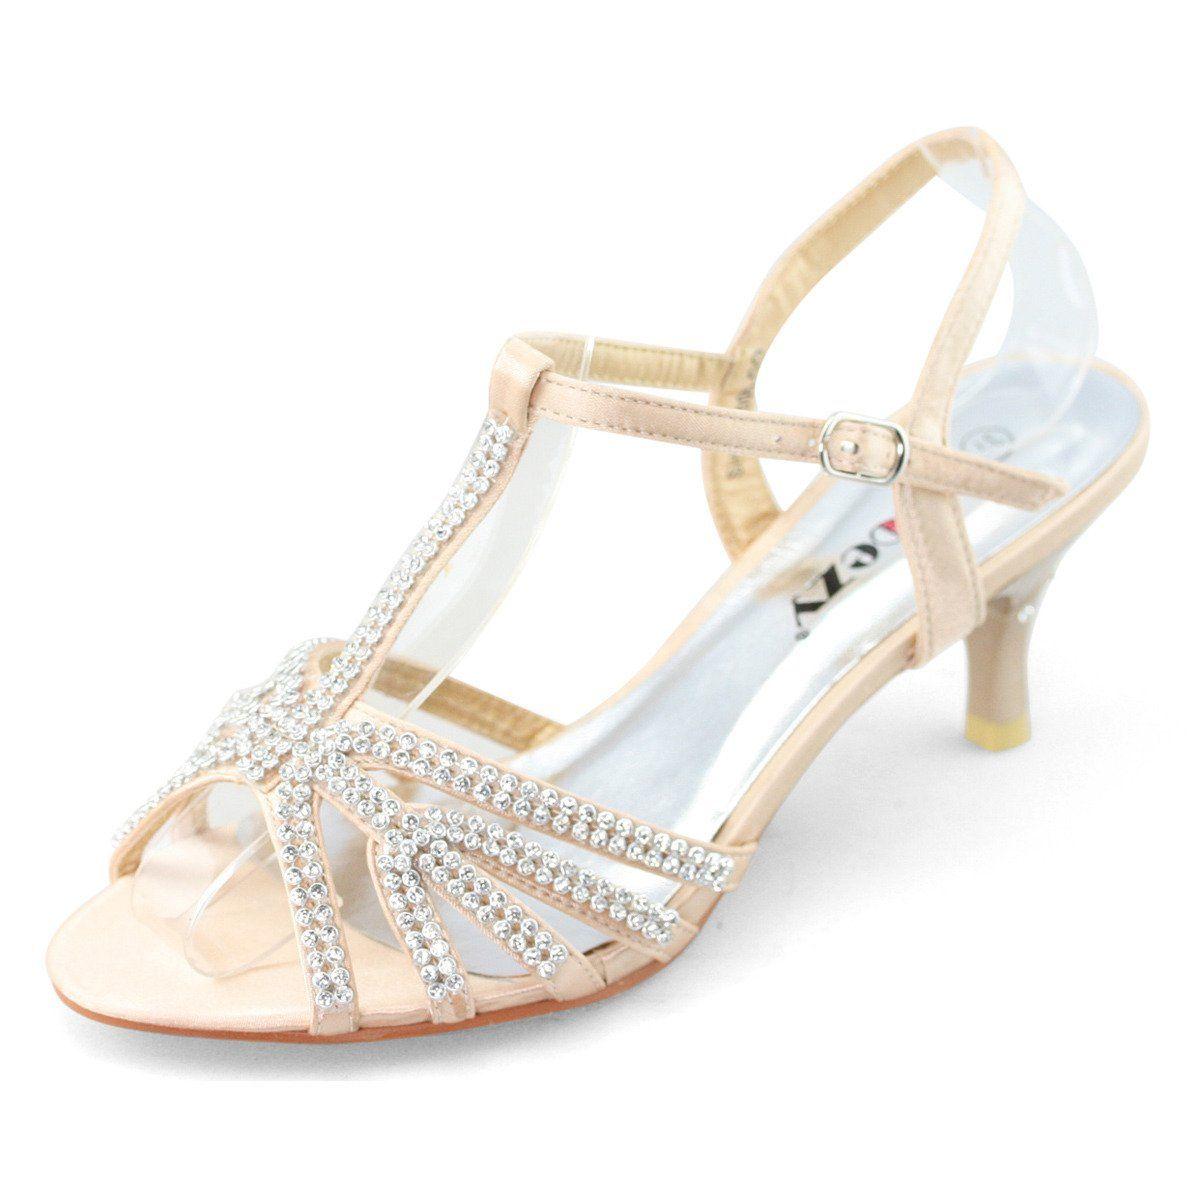 SHOEZY Women Ladies Low Heel Diamante Wedding Shoes T Bar Strappy Sandal Gold Size US 9